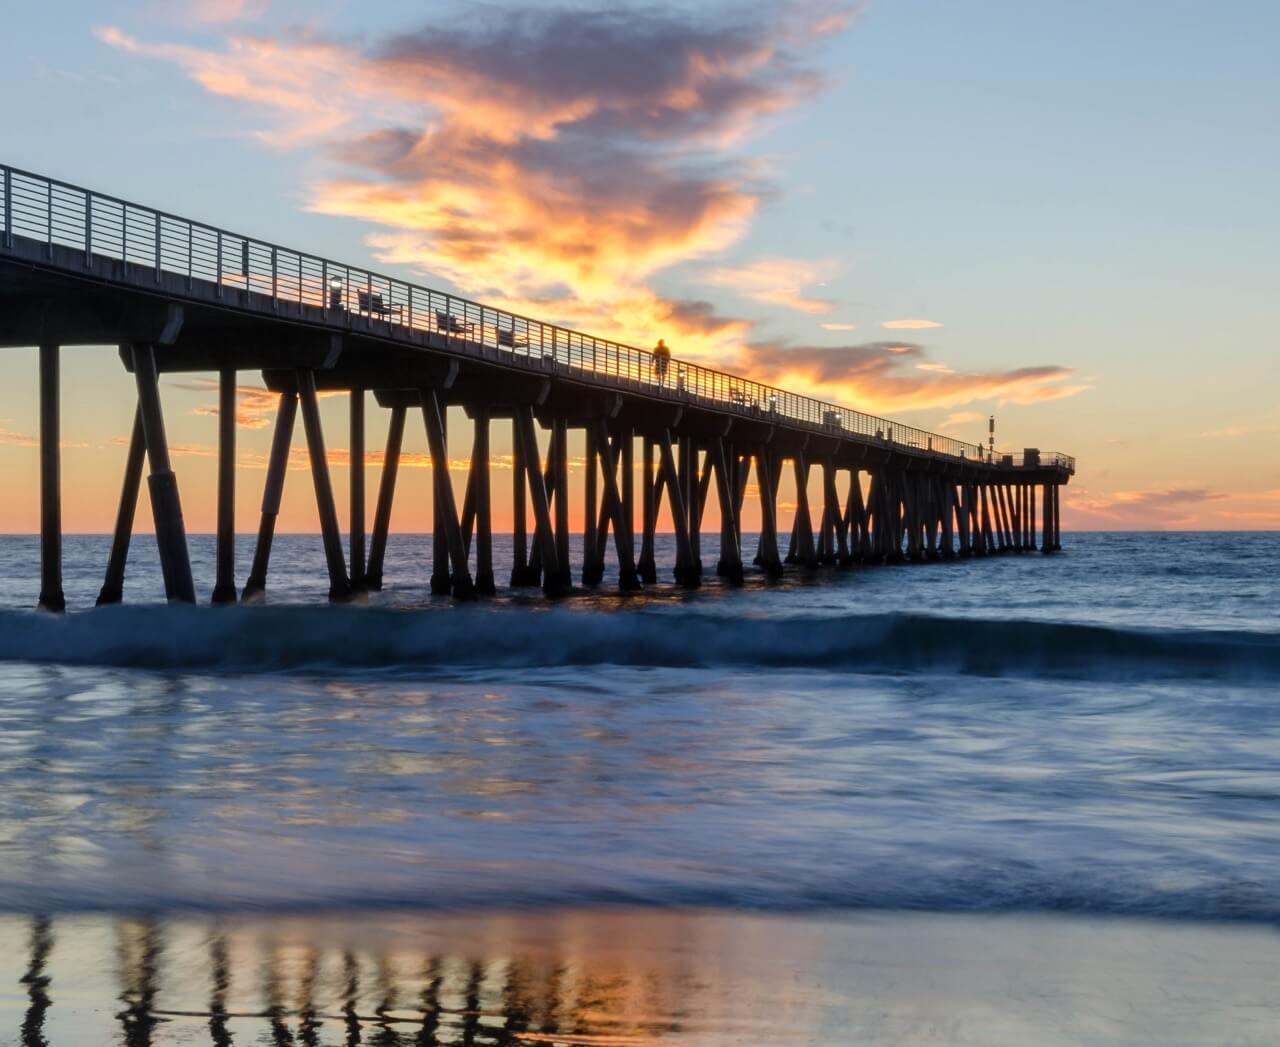 Keith Yahl - Hermosa Beach Pier